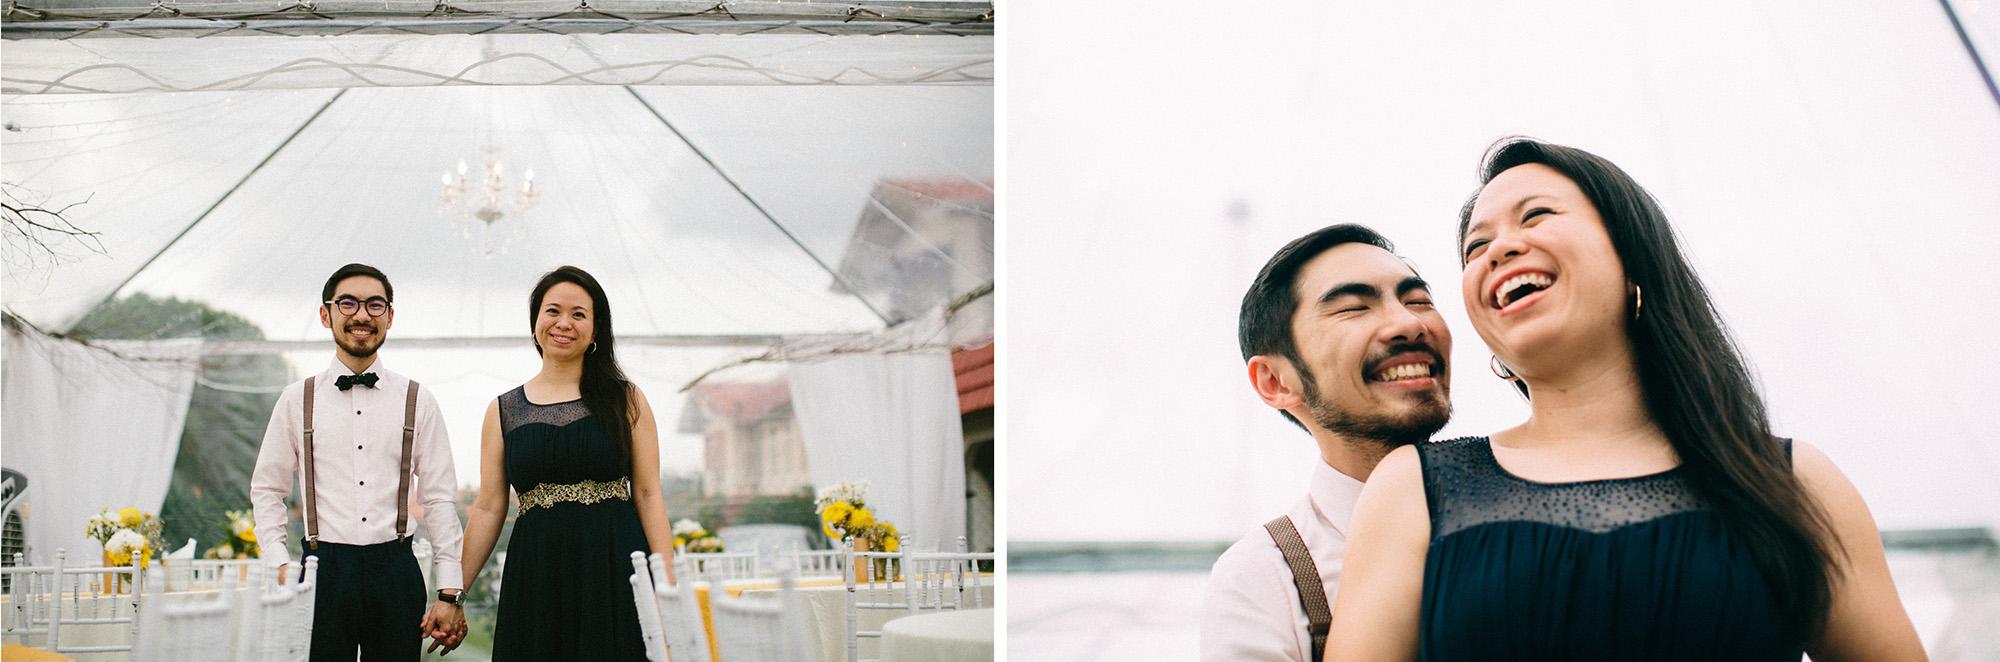 83-hellojanelee-sam grace-malaysia-wedding-day